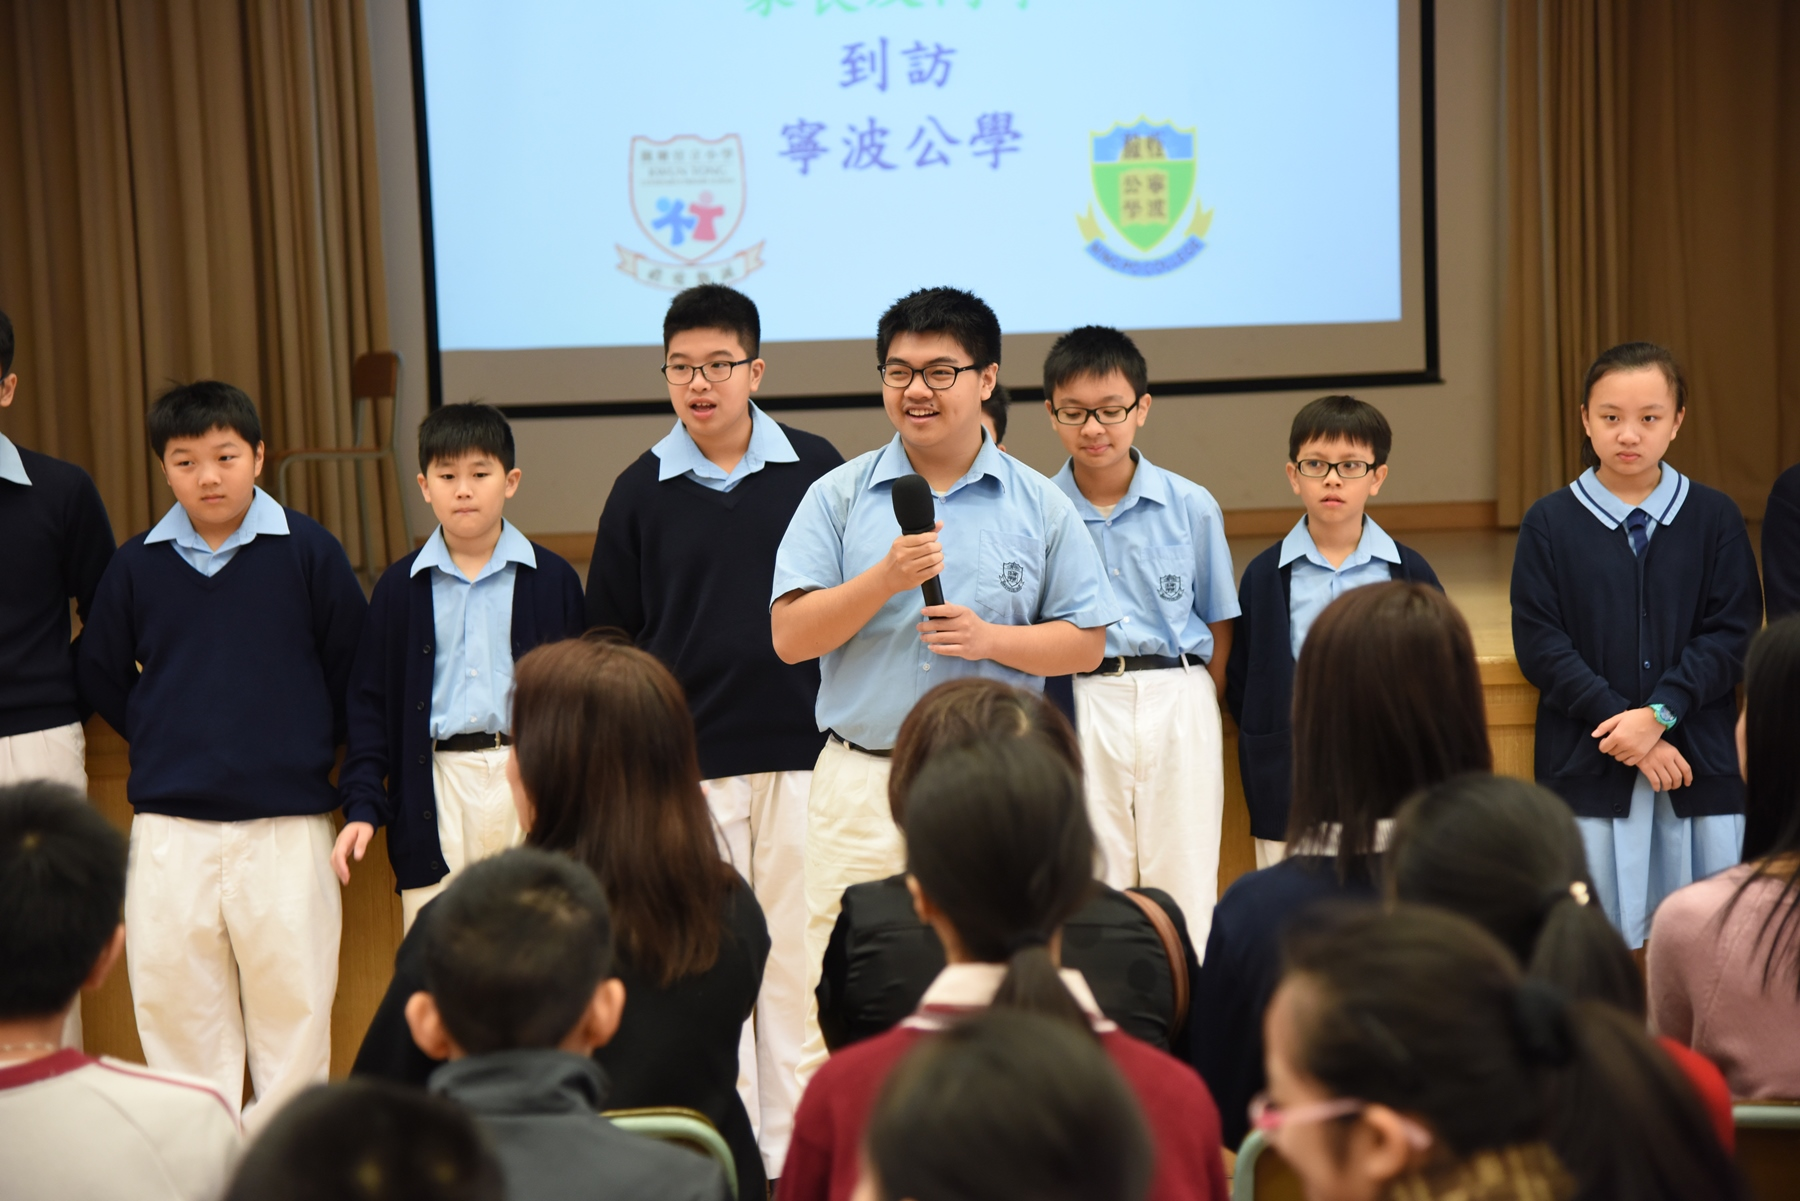 http://npc.edu.hk/sites/default/files/dsc_4923.jpg